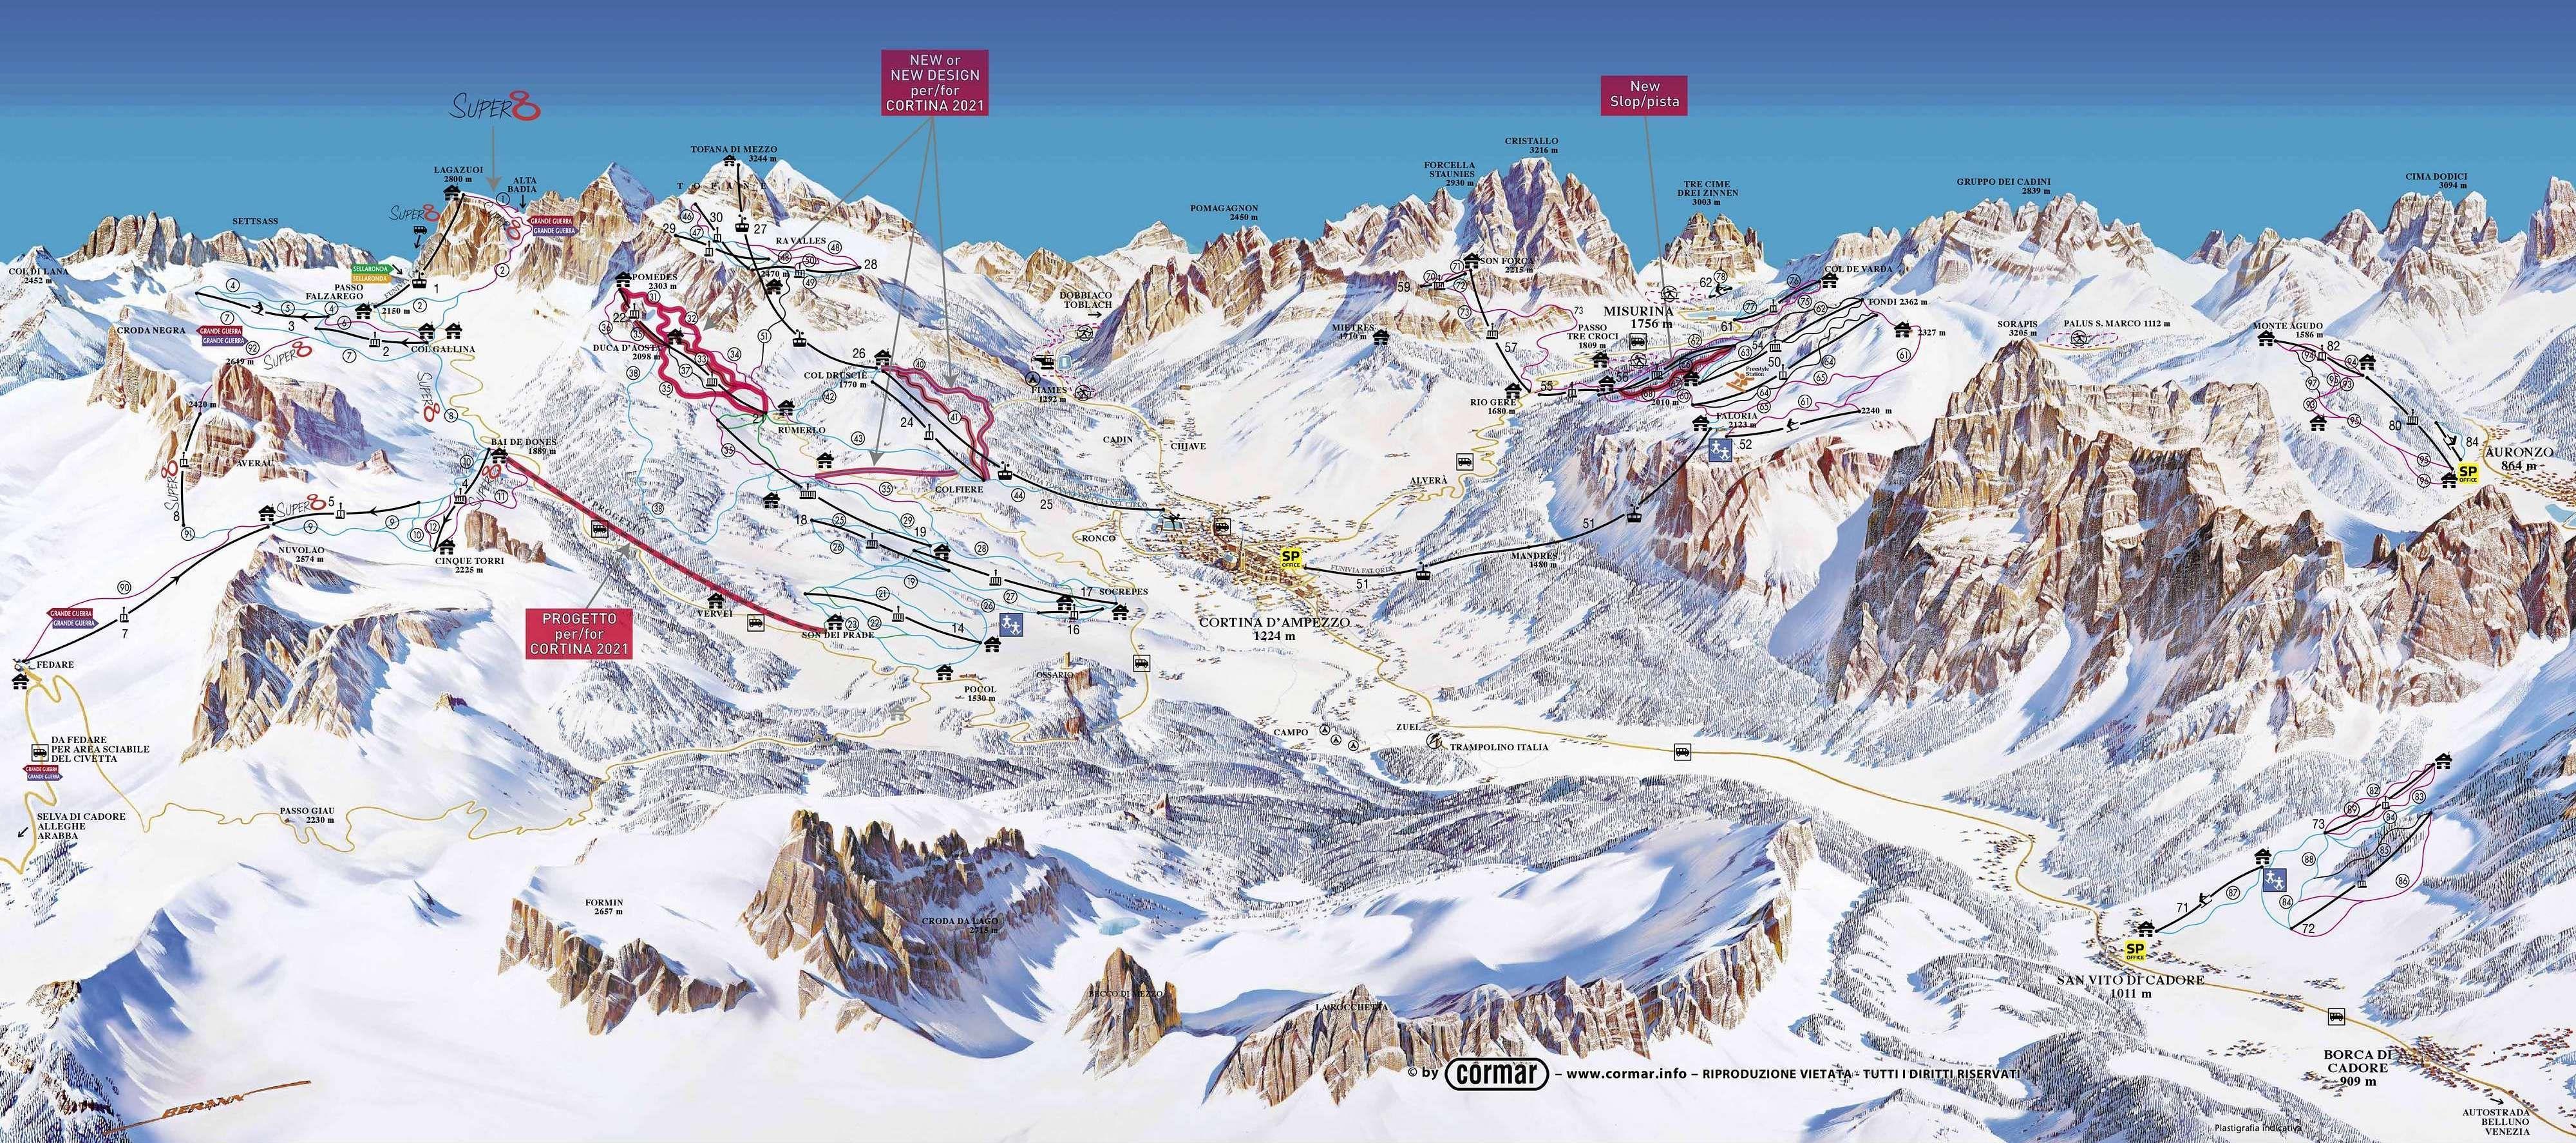 Cortina d'Ampezzo (2019-2020)